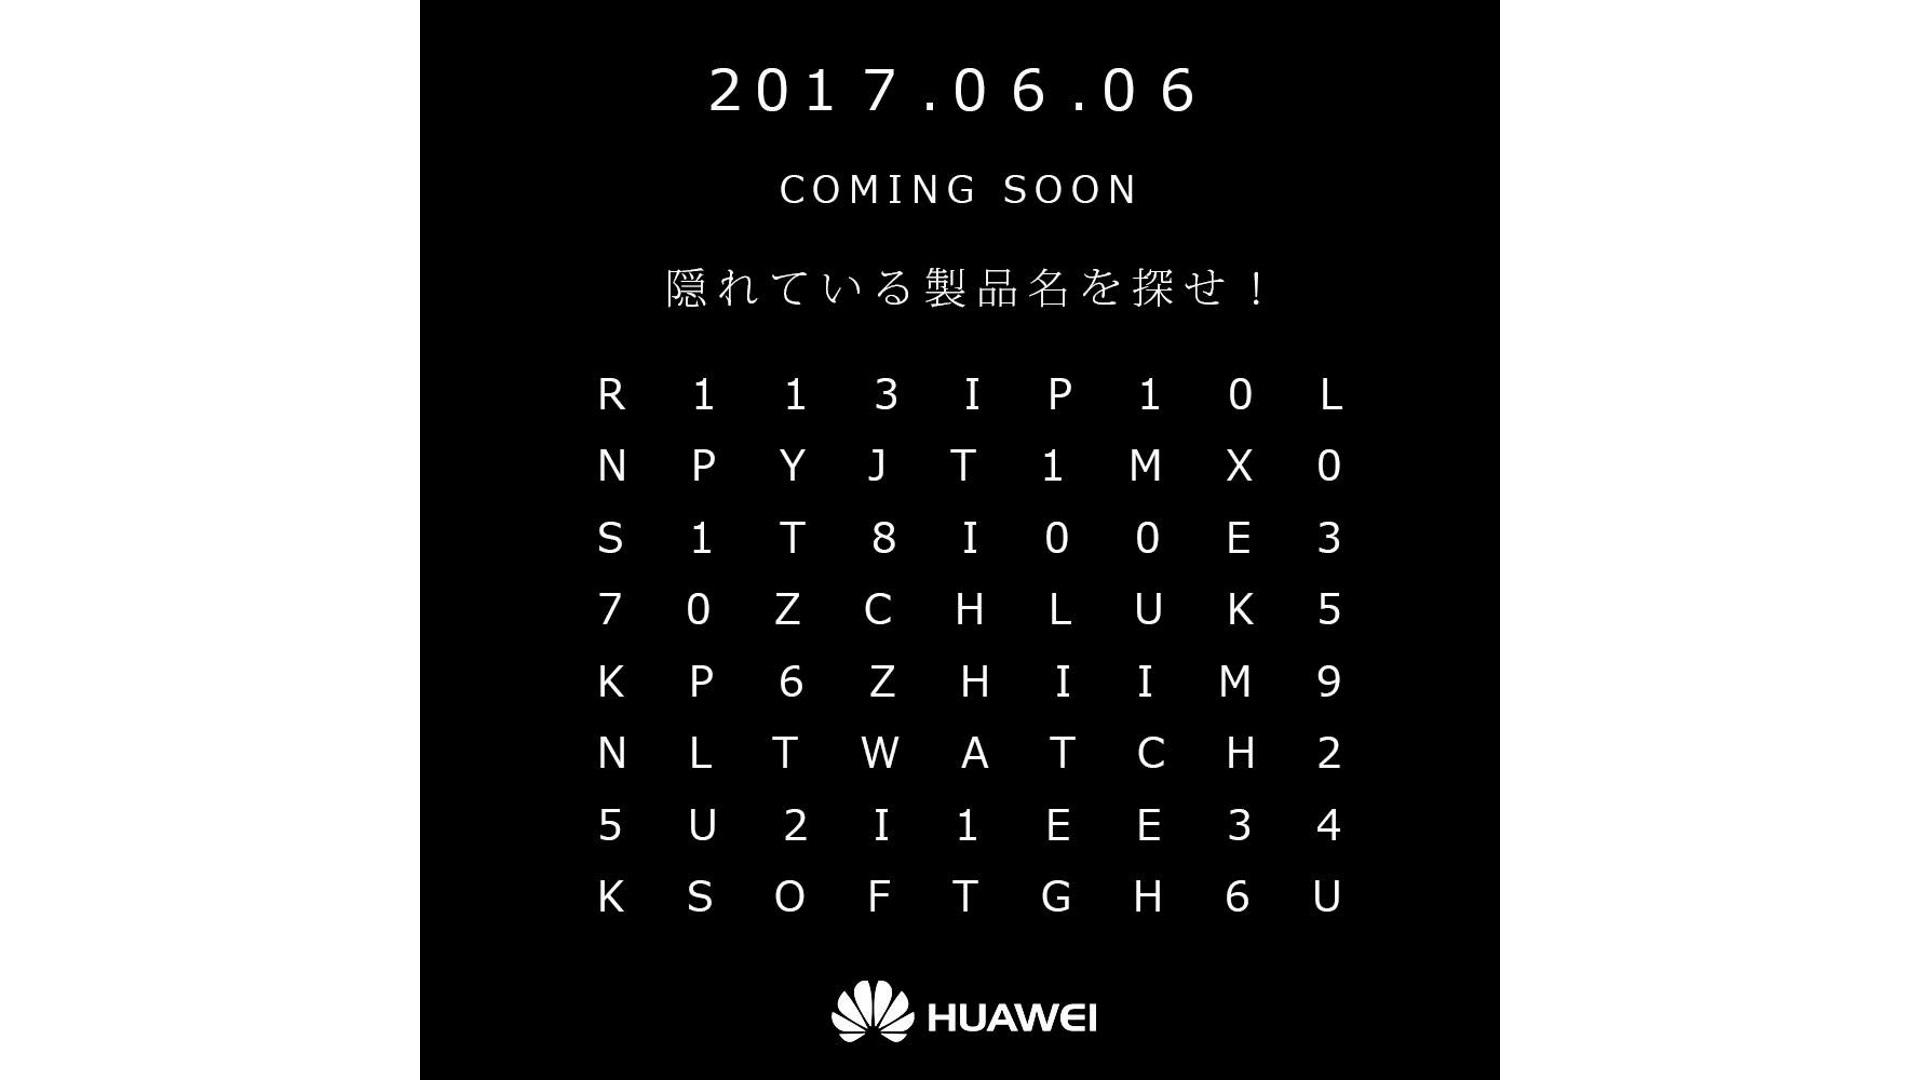 Huawei、6月6日の国内向け新製品発表に向けた暗号ティザーを公開